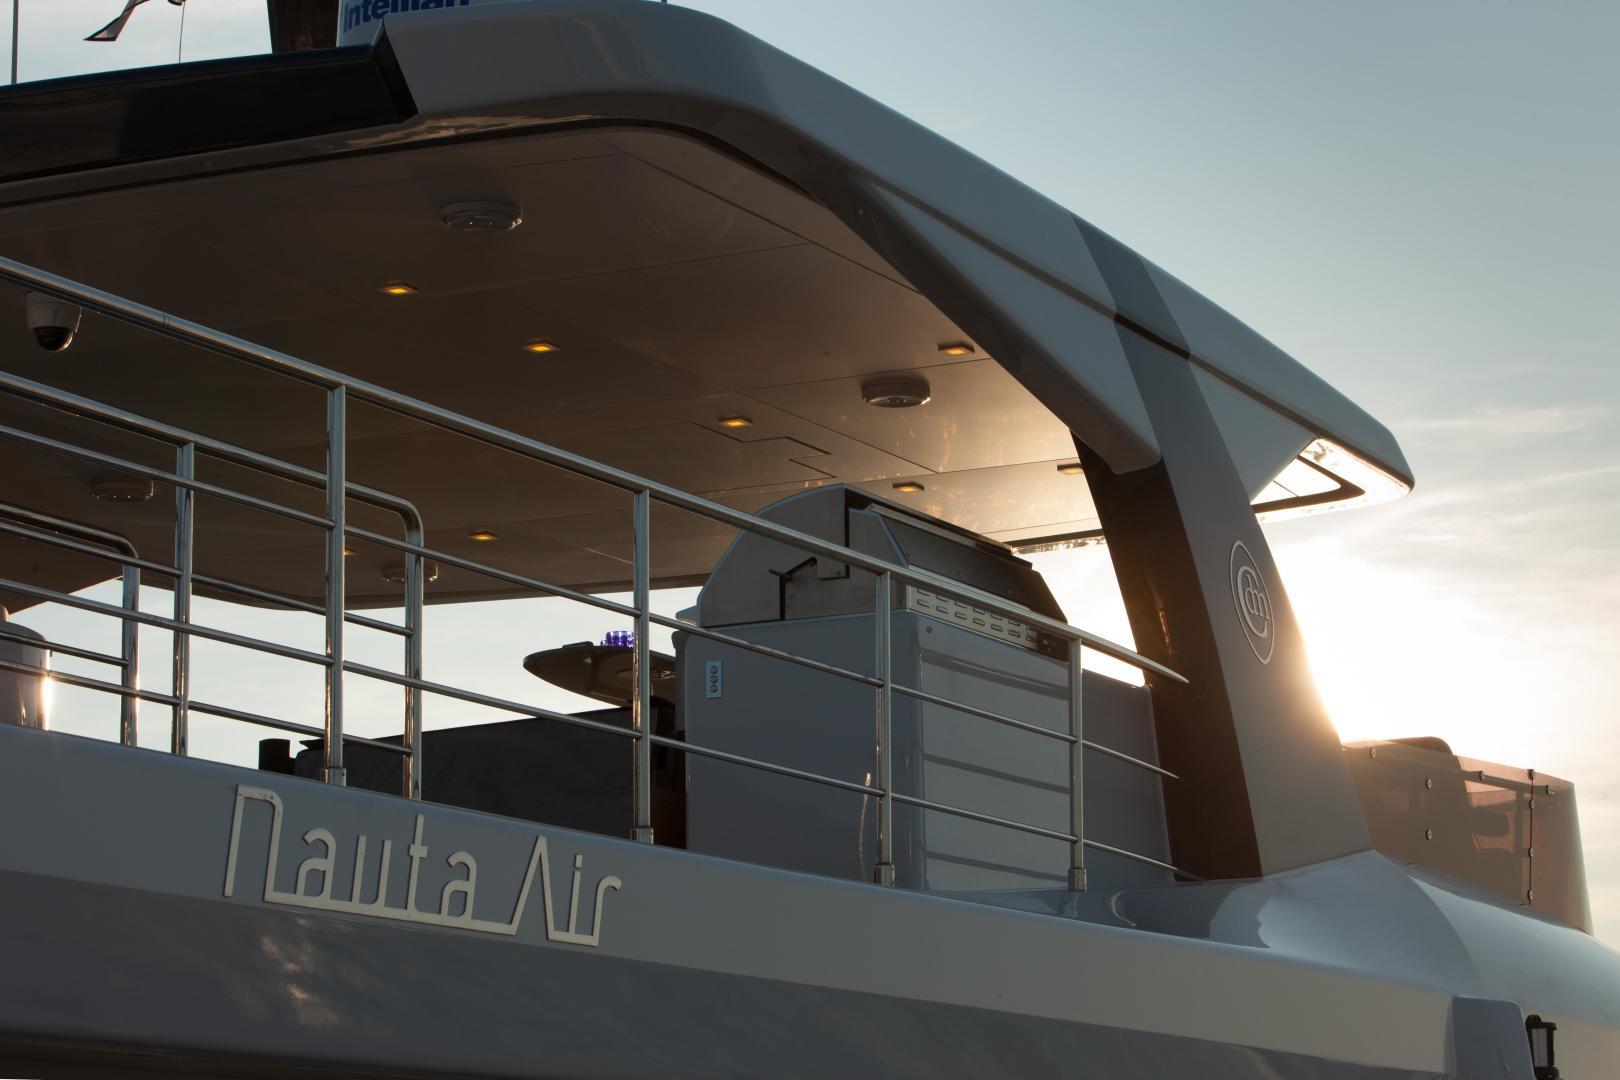 Cantiere Delle Marche-Nauta Air 86 2014-ROSEY Olbia, Sardinia-Italy-1366164 | Thumbnail